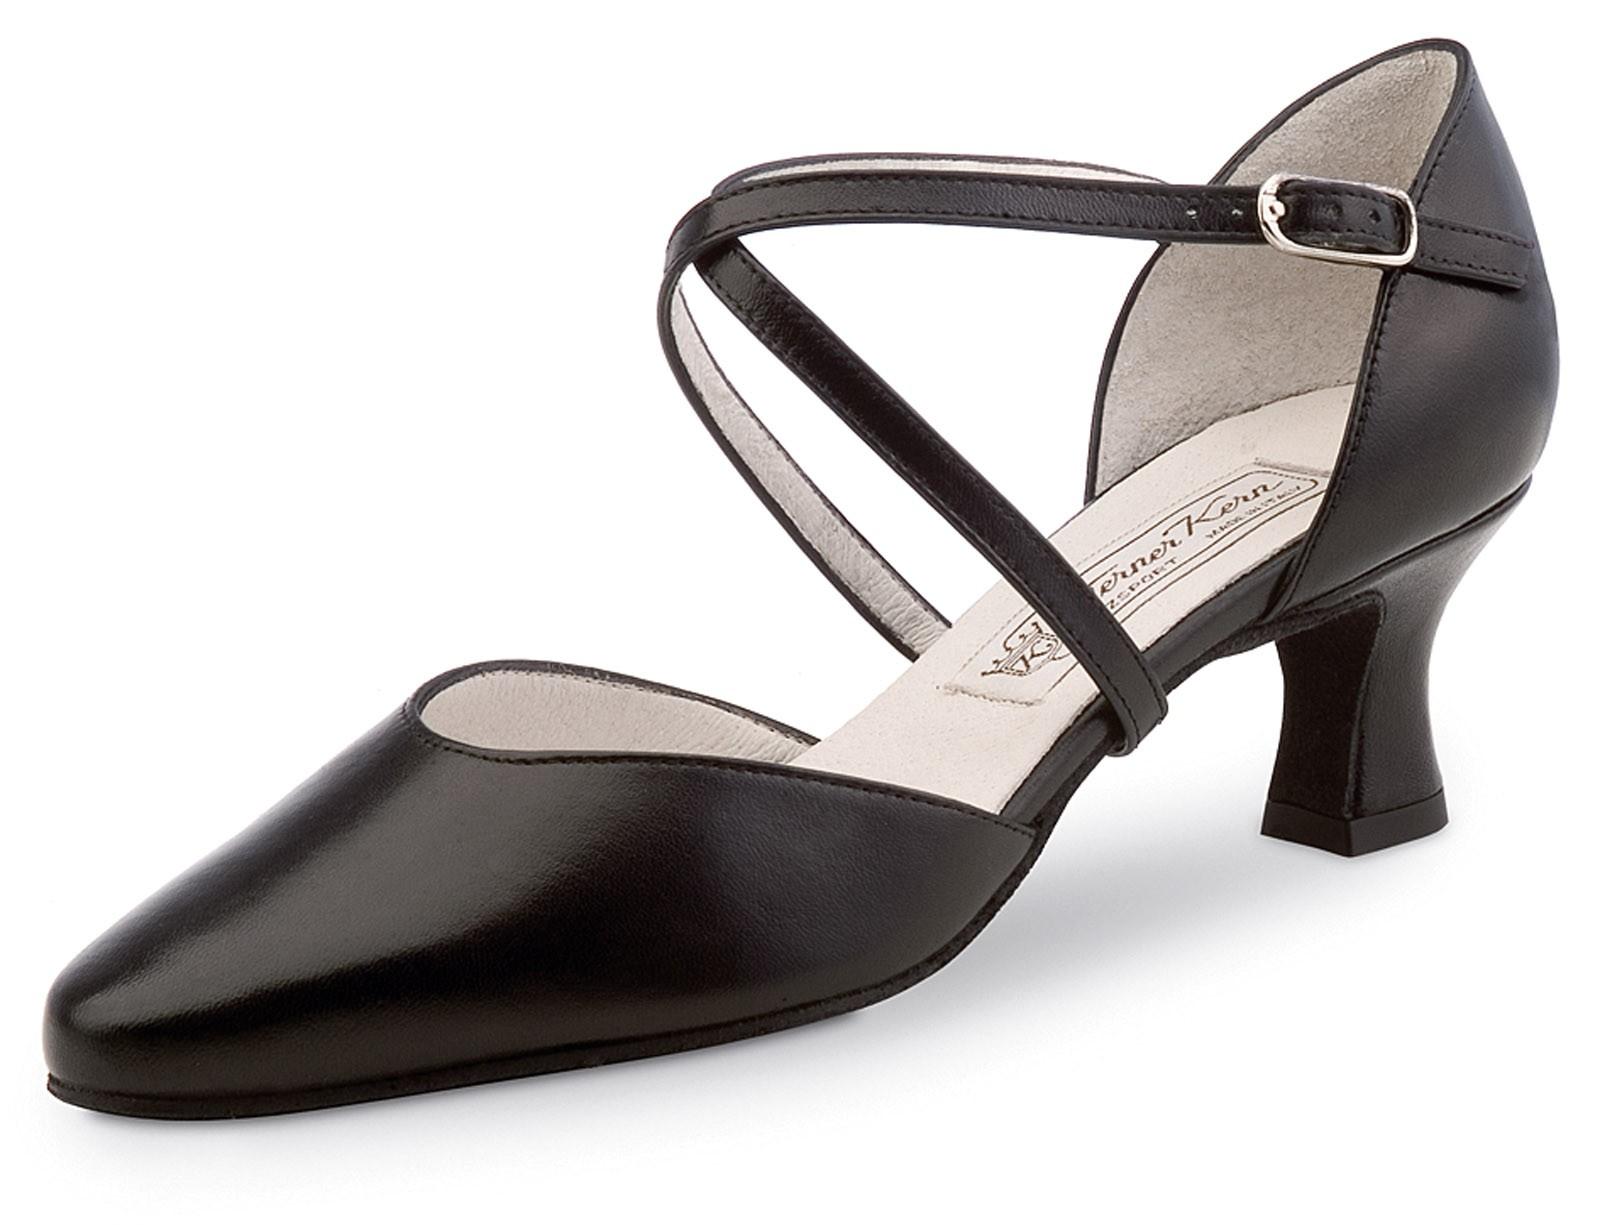 Werner Kern Femmes Chaussures de Danse Patty - Cuir Noir - 5,5 cm [UK 6]